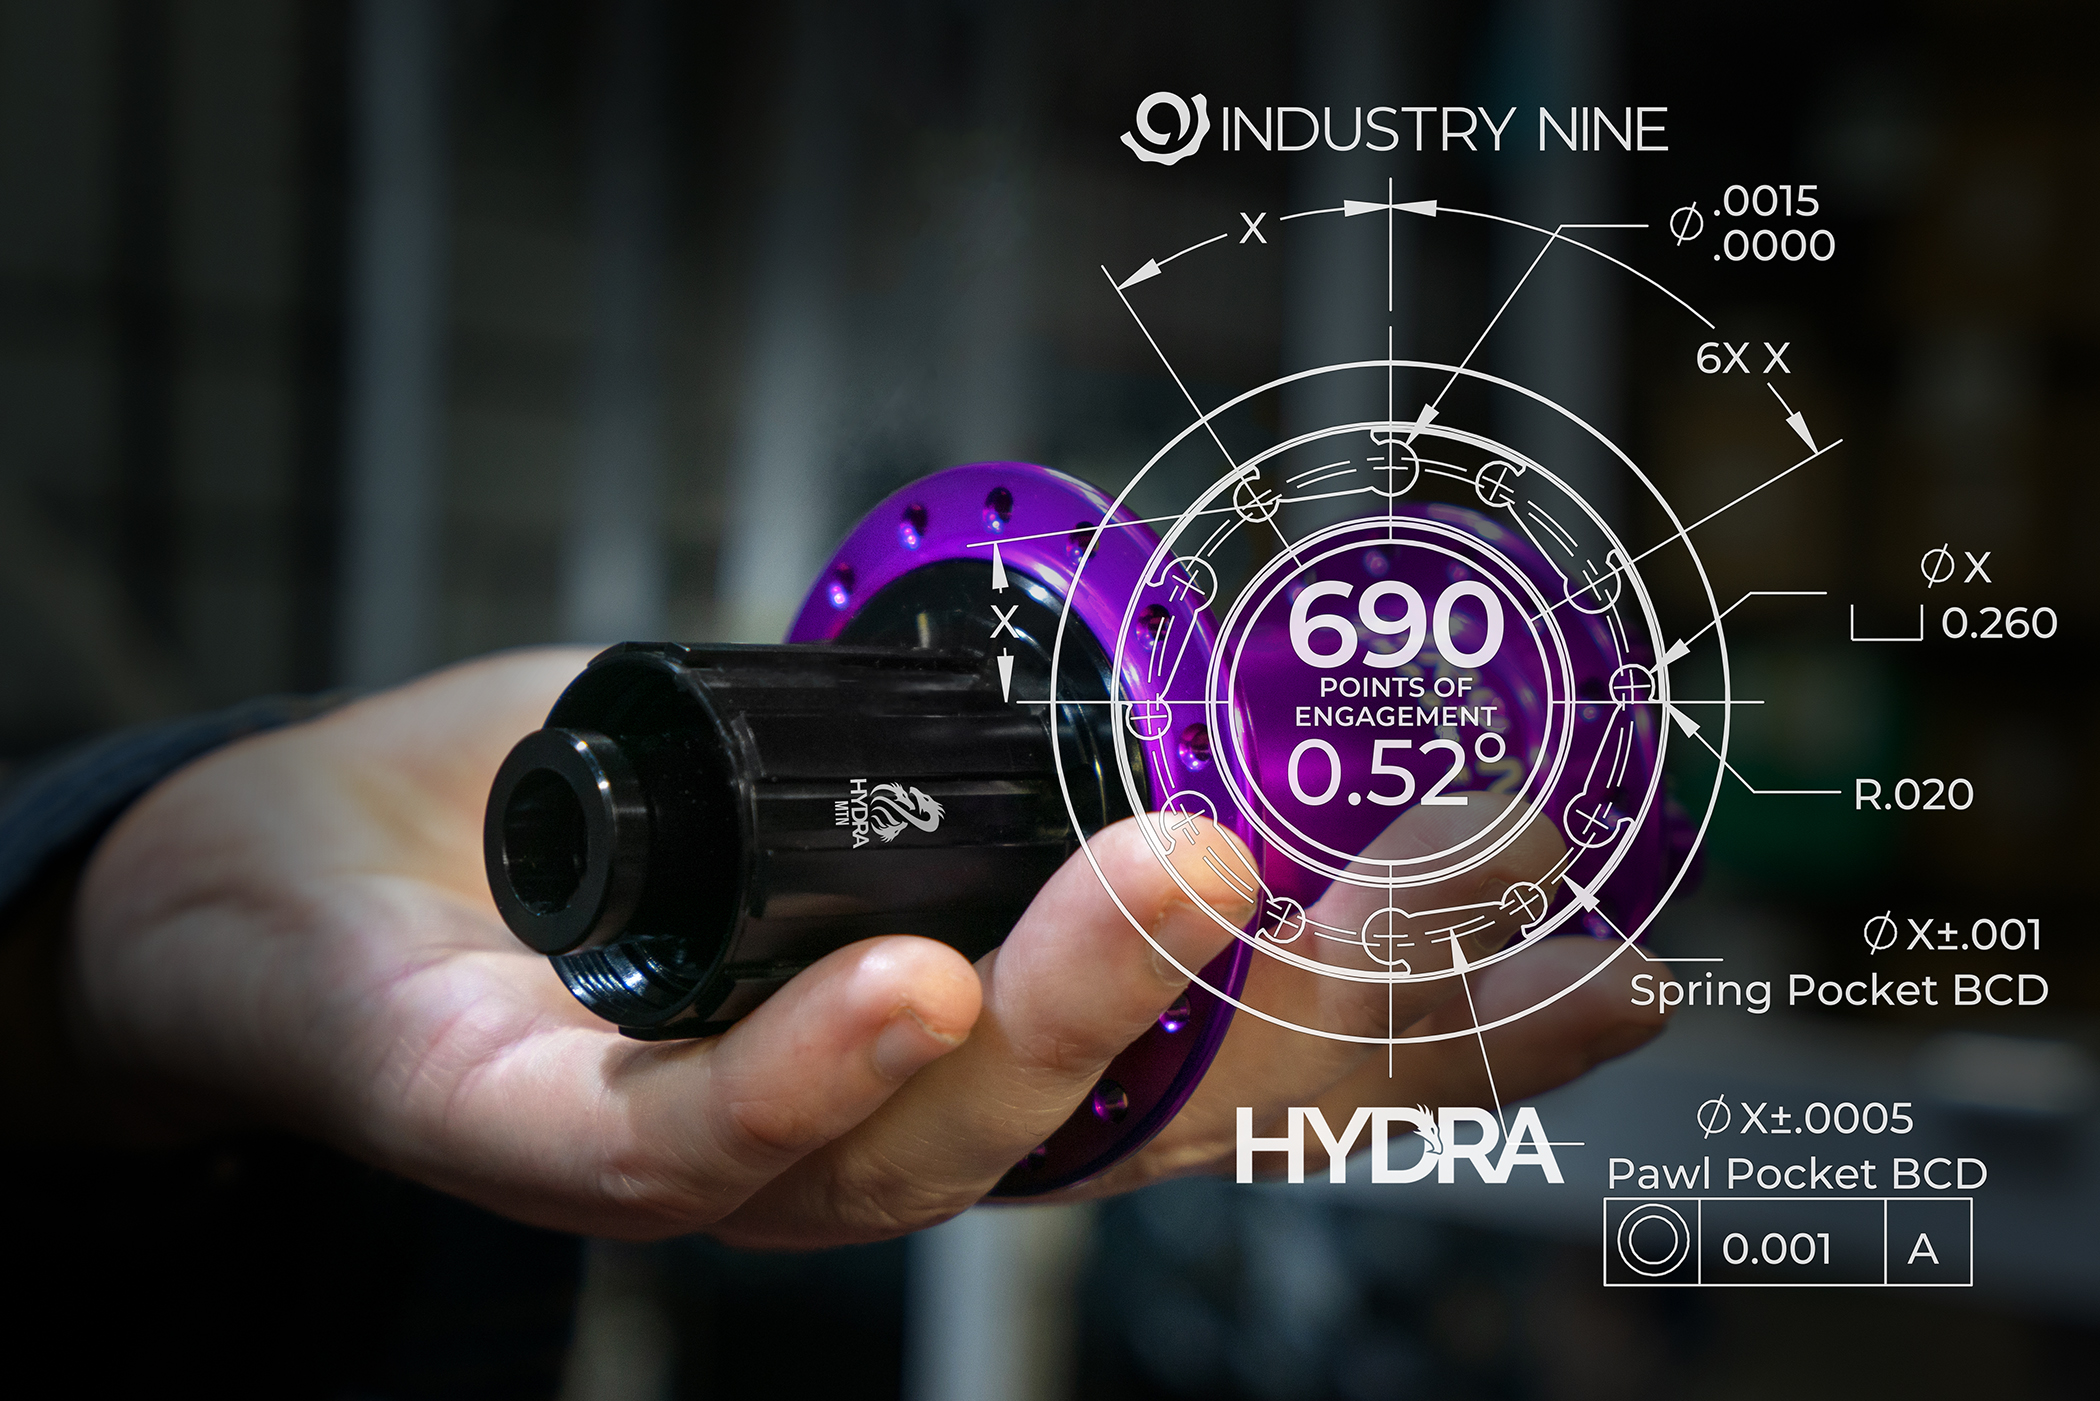 HYDRA_Hub_in_hand-purple_CAD_POE[1].jpg